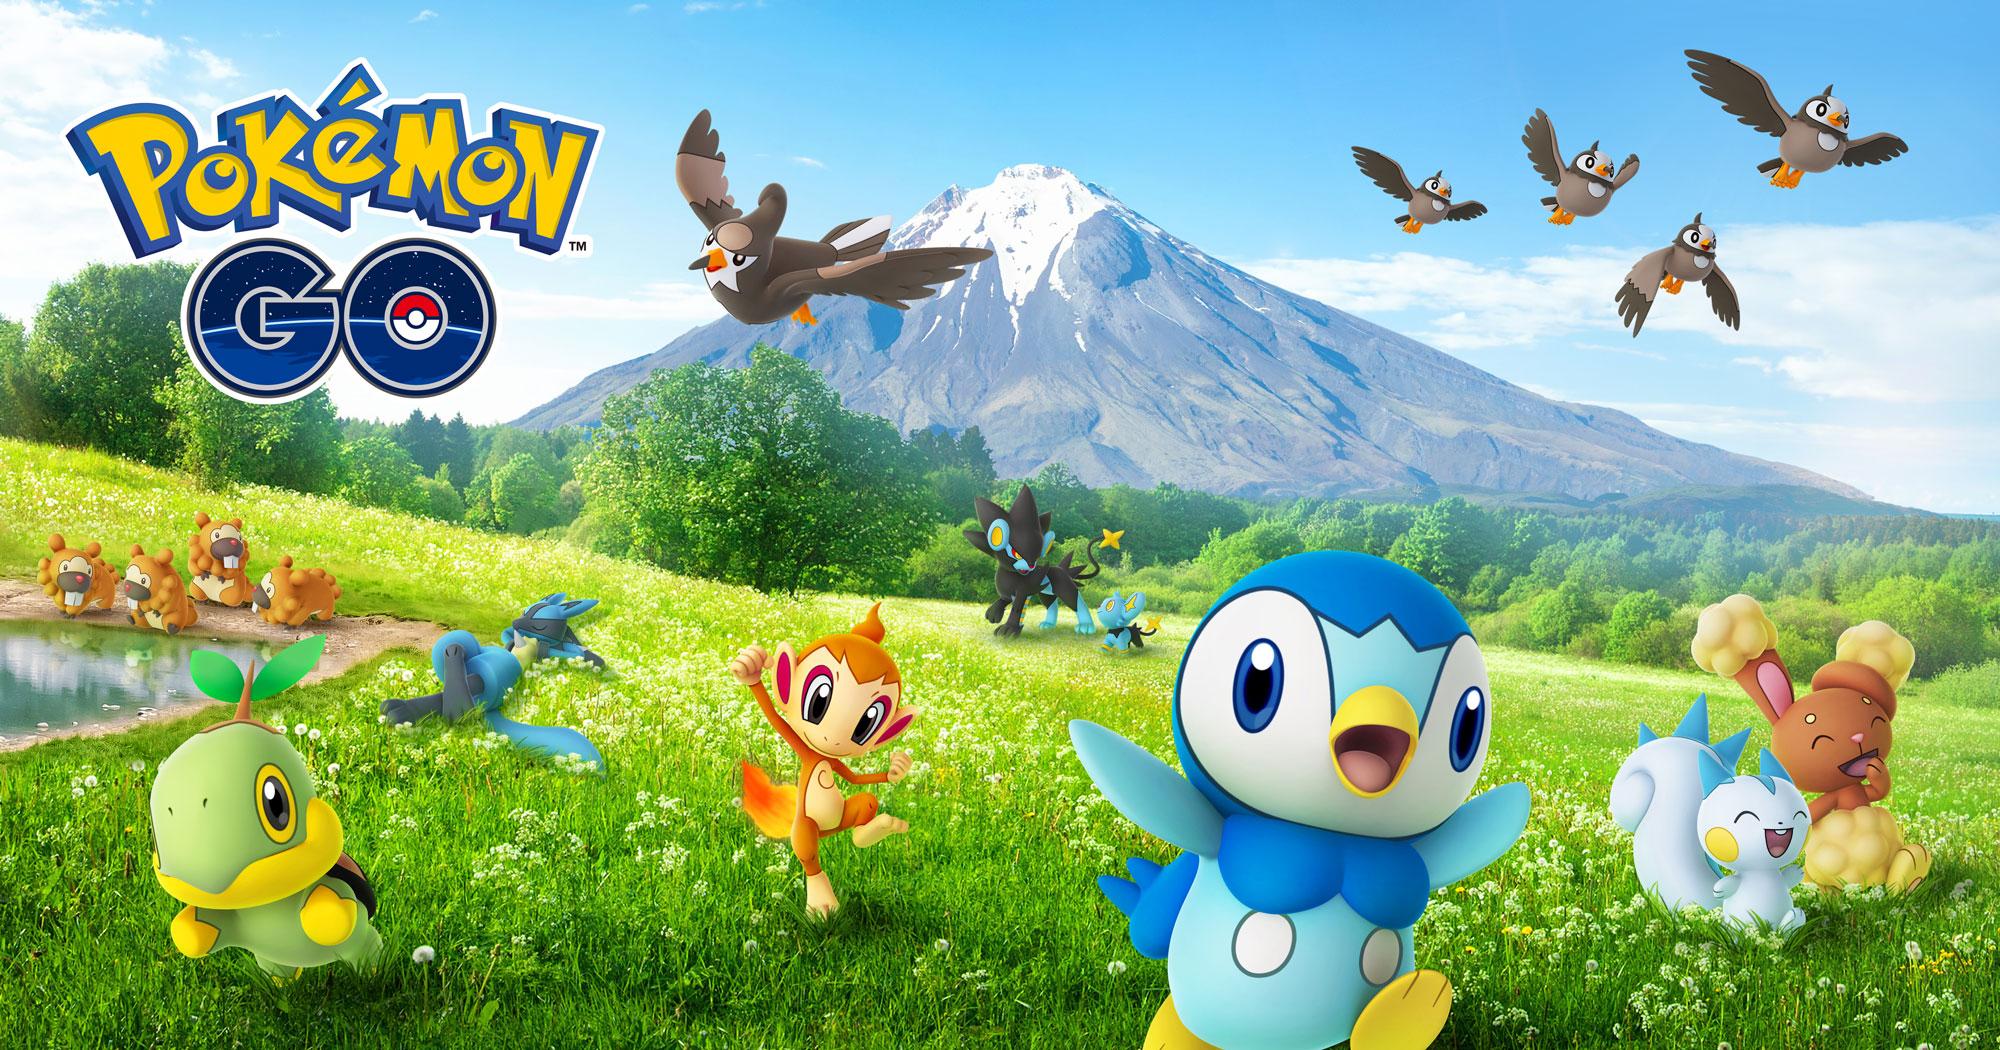 Gen IV info roundup: raids, eggs, regionals and shiny Shinx - Pokémon GO Hub